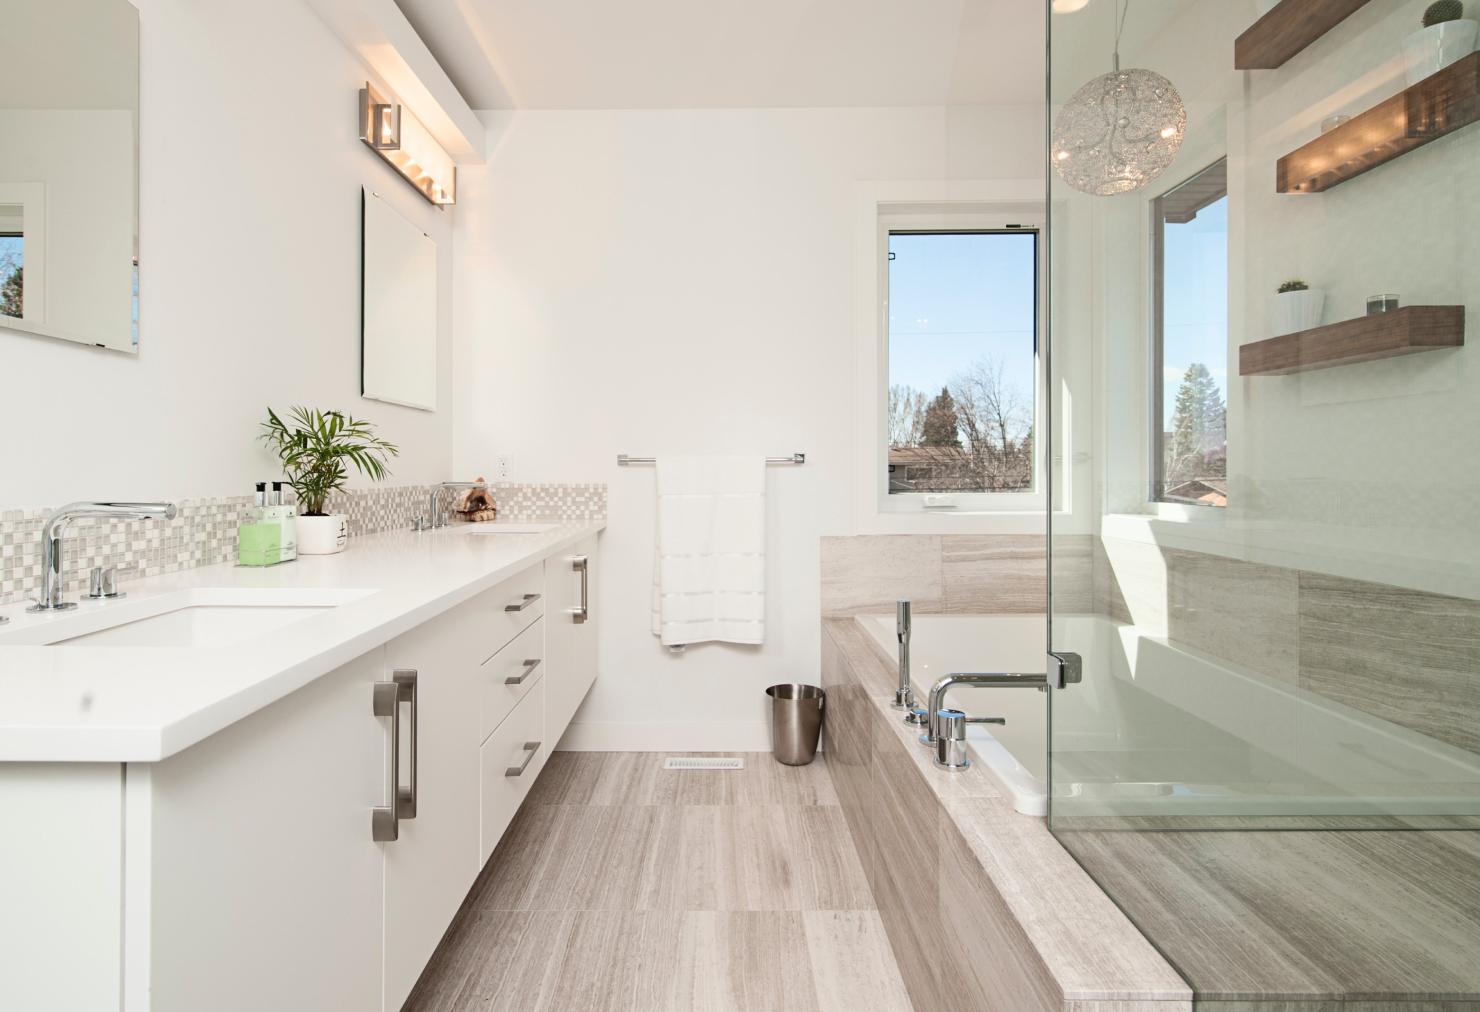 Decoration Of Your Bathroom: Unusual Tips